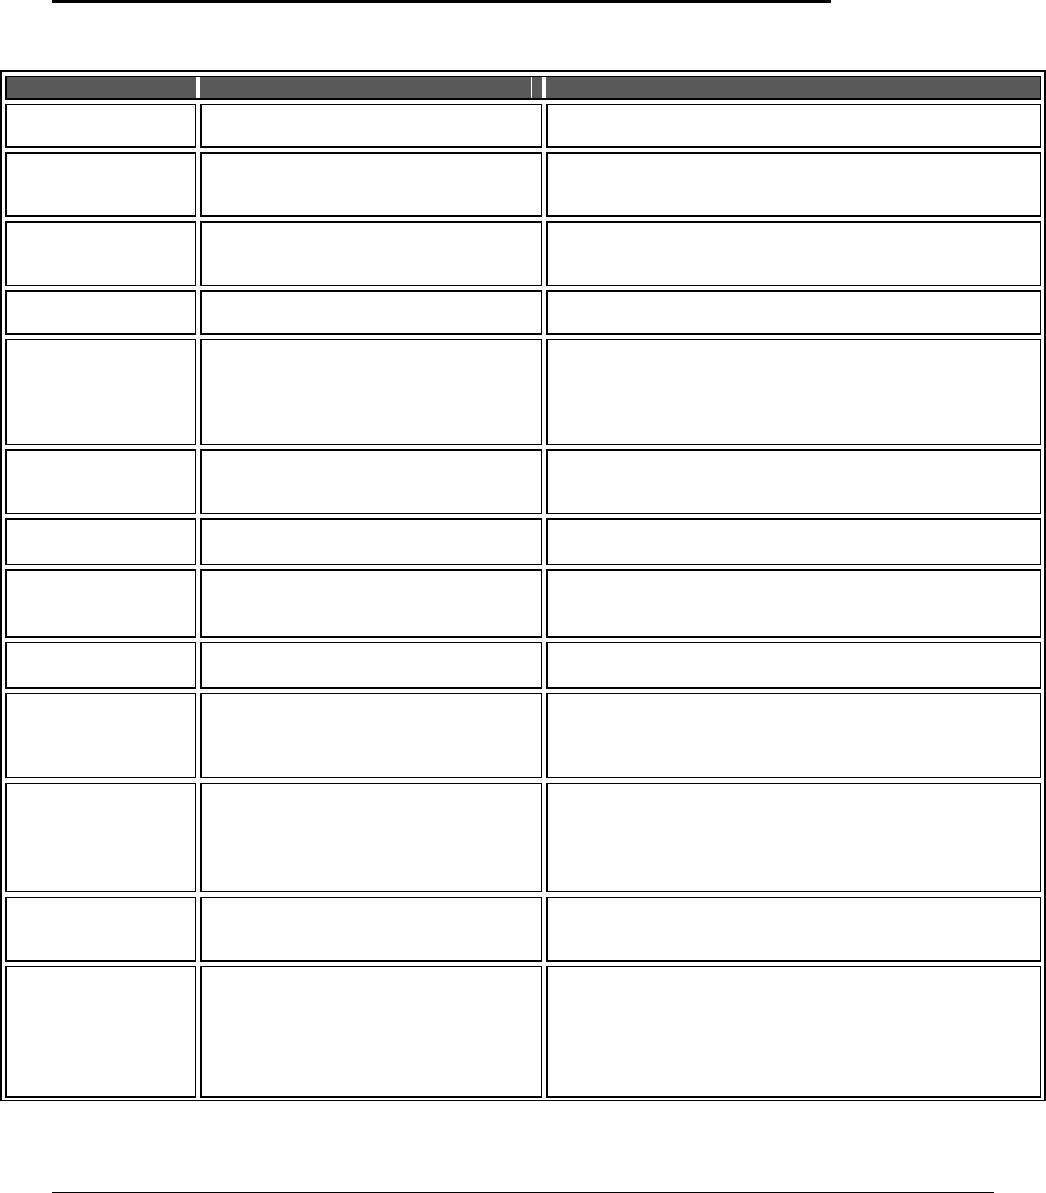 VeriFone VX 520 Merchant Manual Download - Error Messages